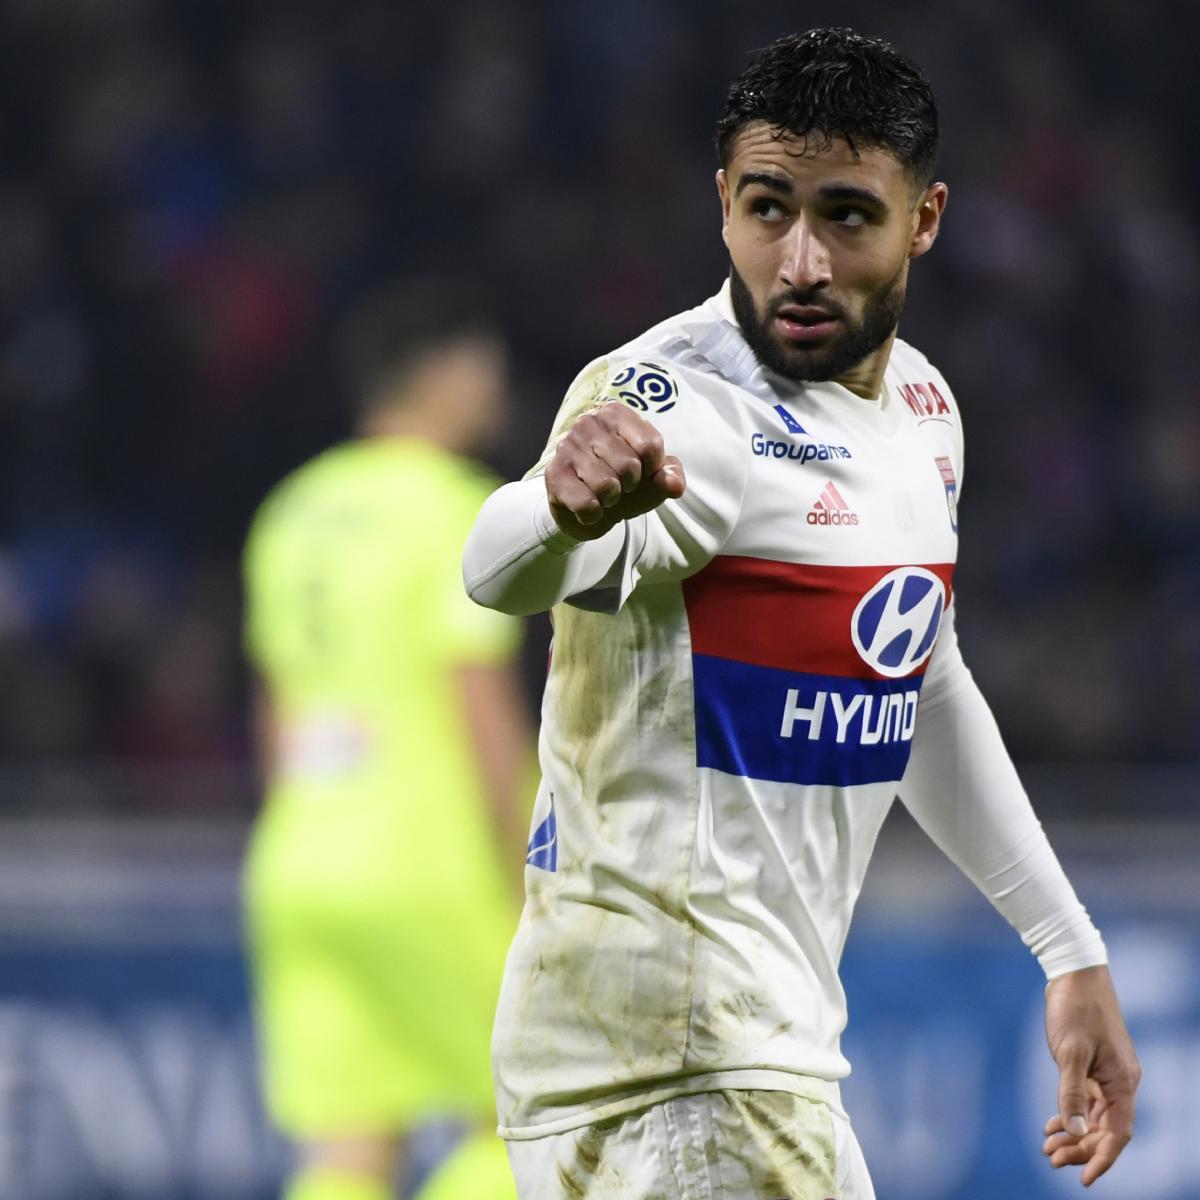 Liverpool Transfer News: Nabil Fekir Talks Resumed in Latest Rumours